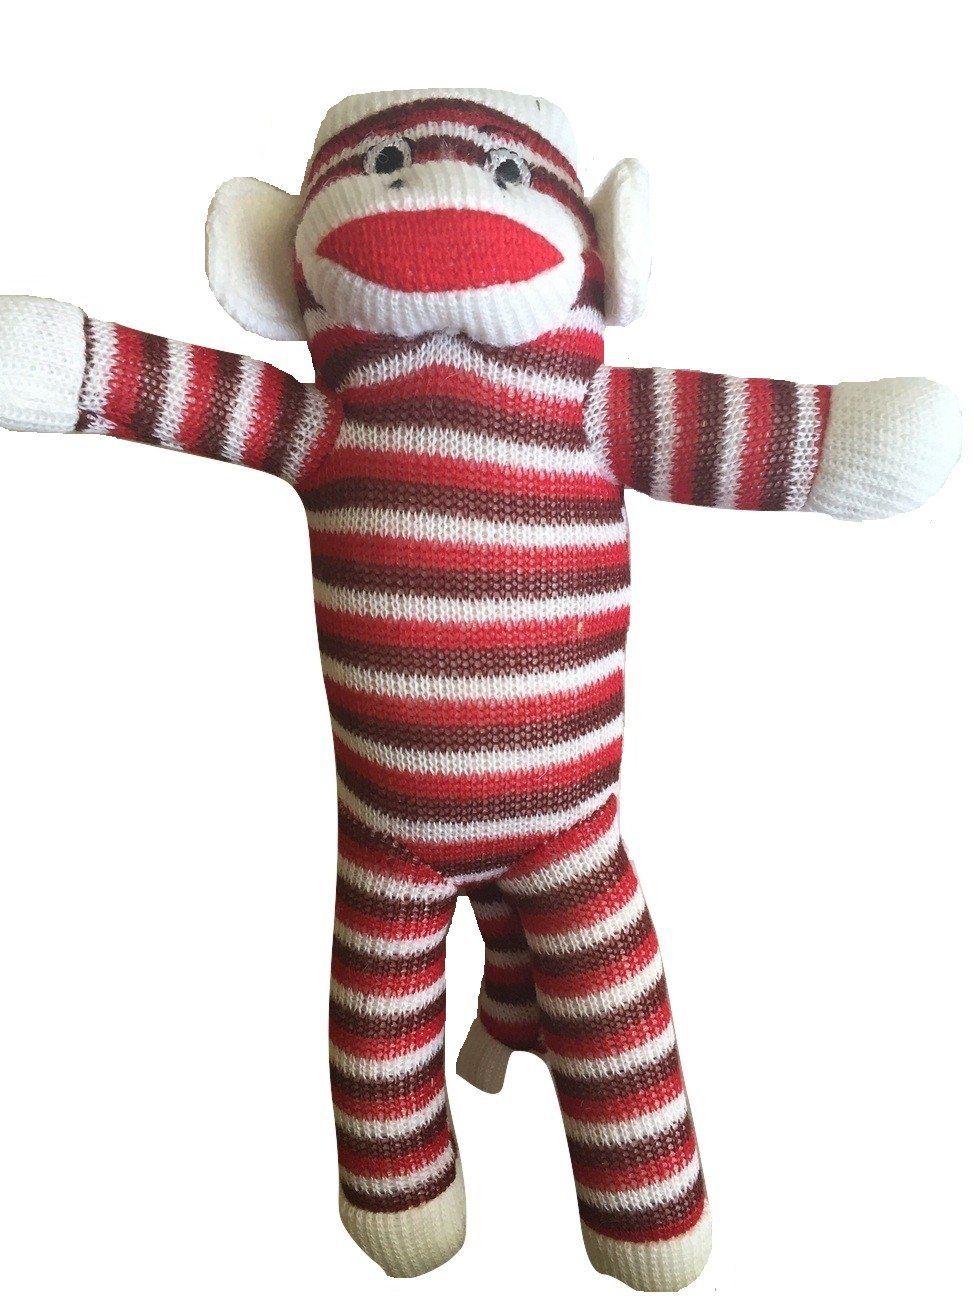 Pet Qwerks 10' Red and White Stripe Sock Monkey Poppy